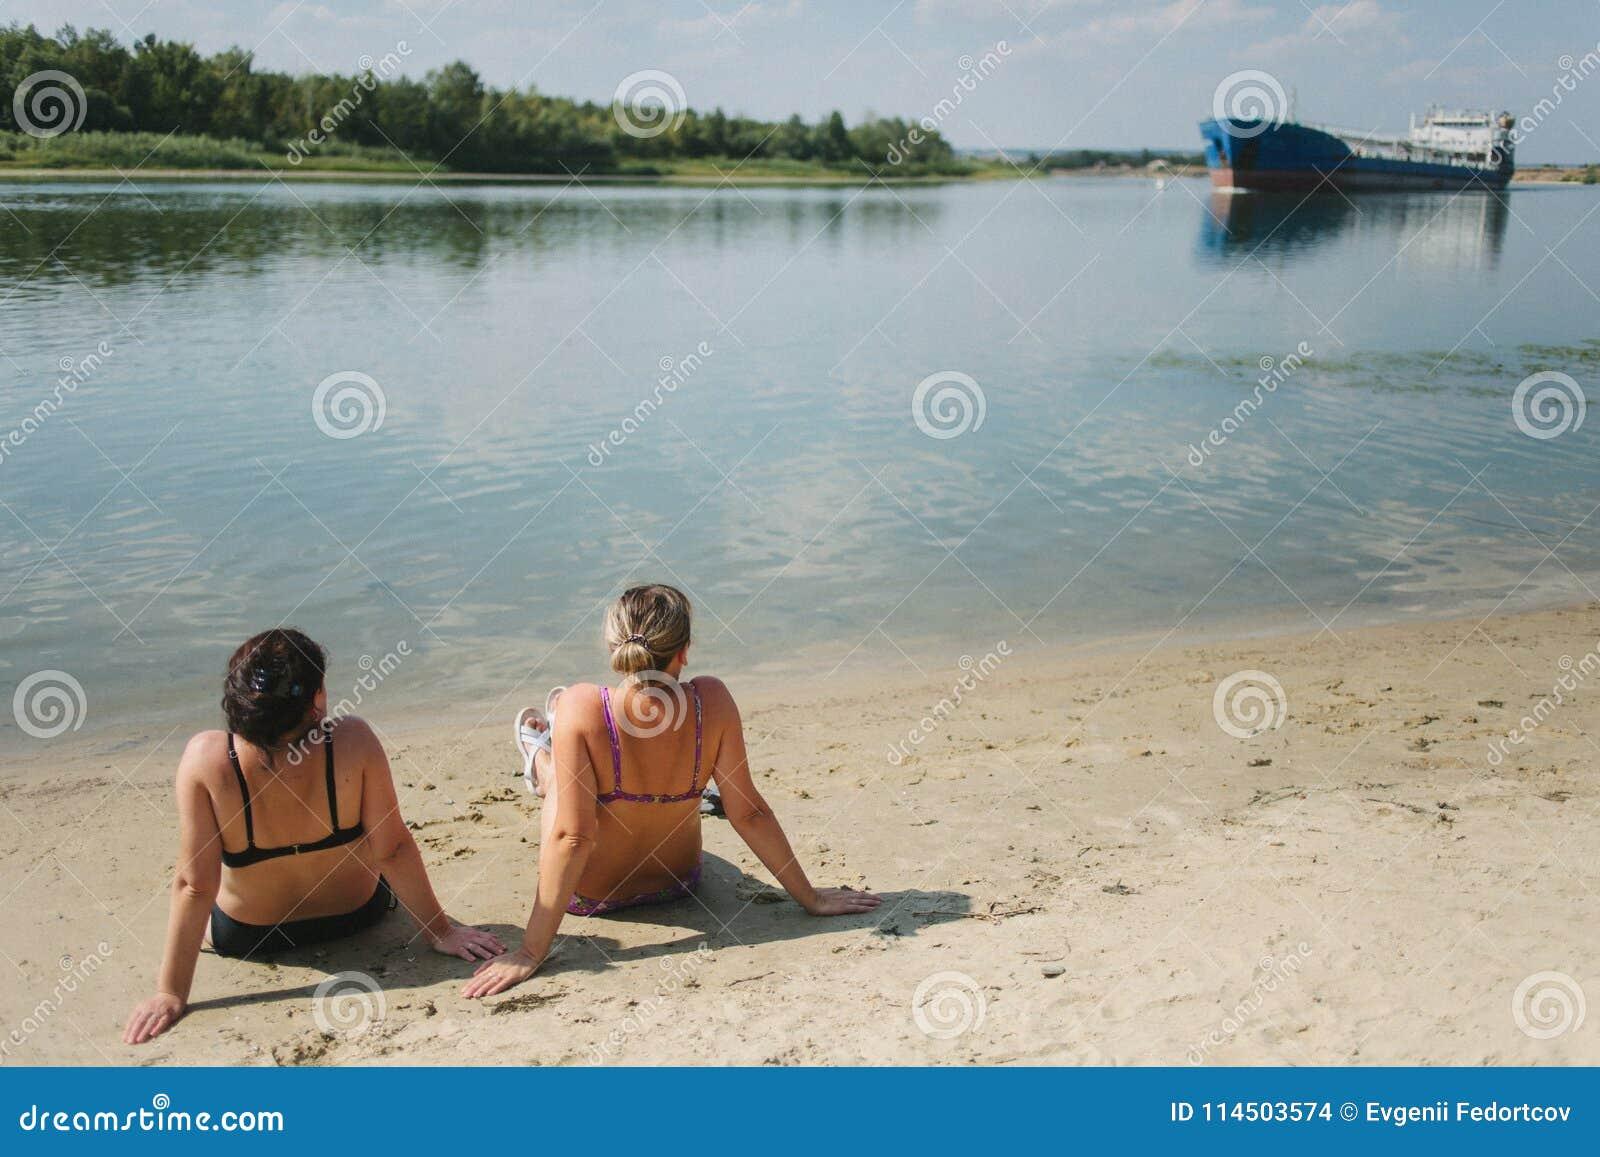 Duas meninas tomam sol